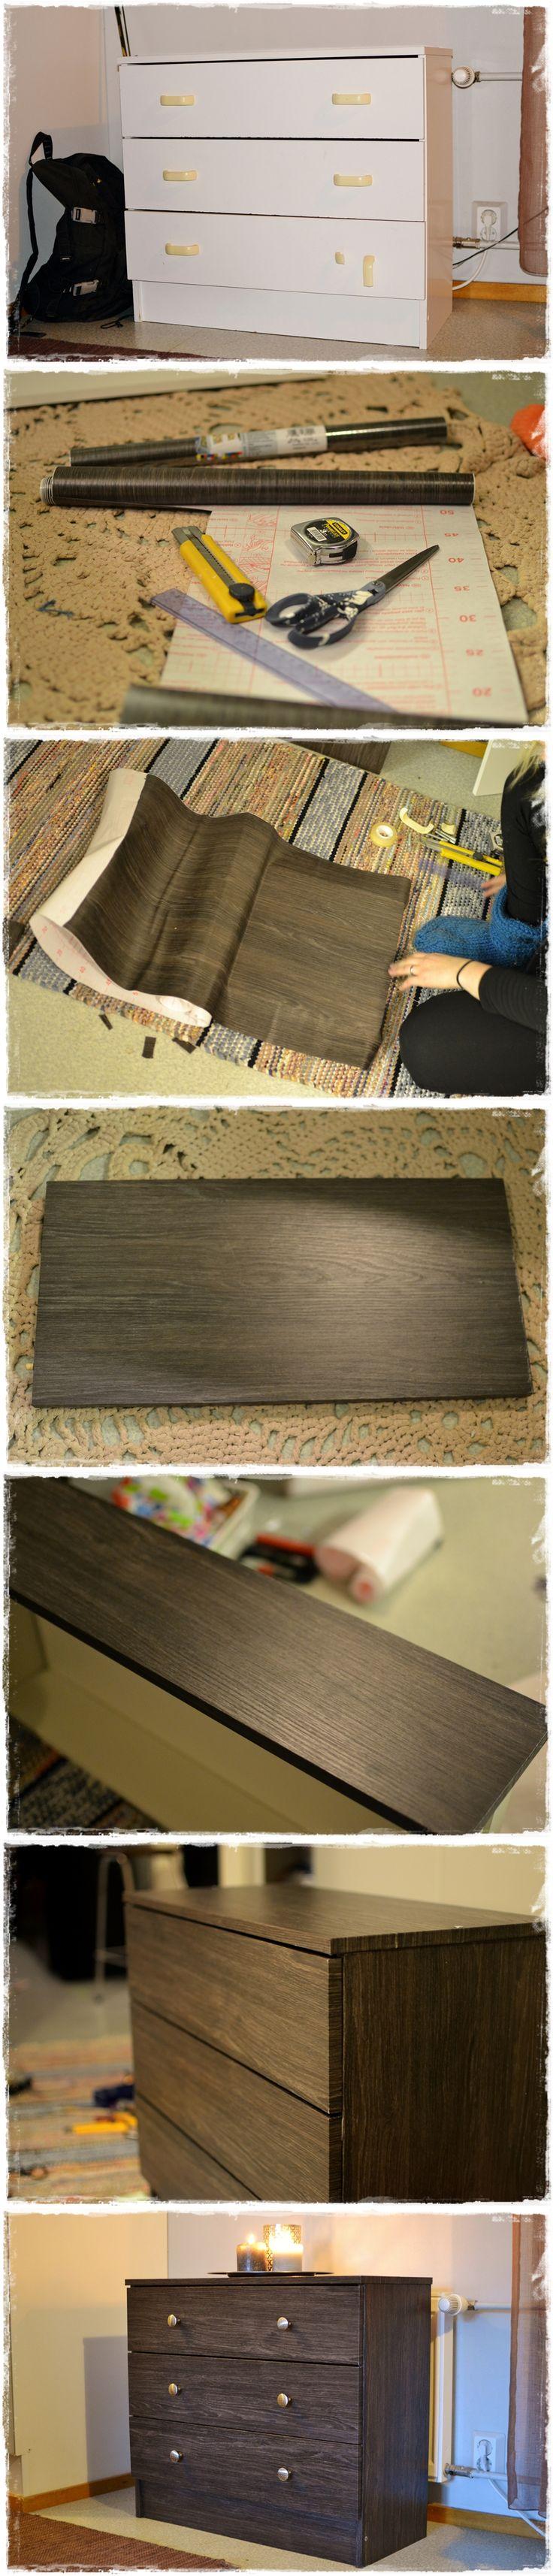 Vanha lipasto sai uuden ilmeen kontaktimuovilla. Chest of drawers makeover